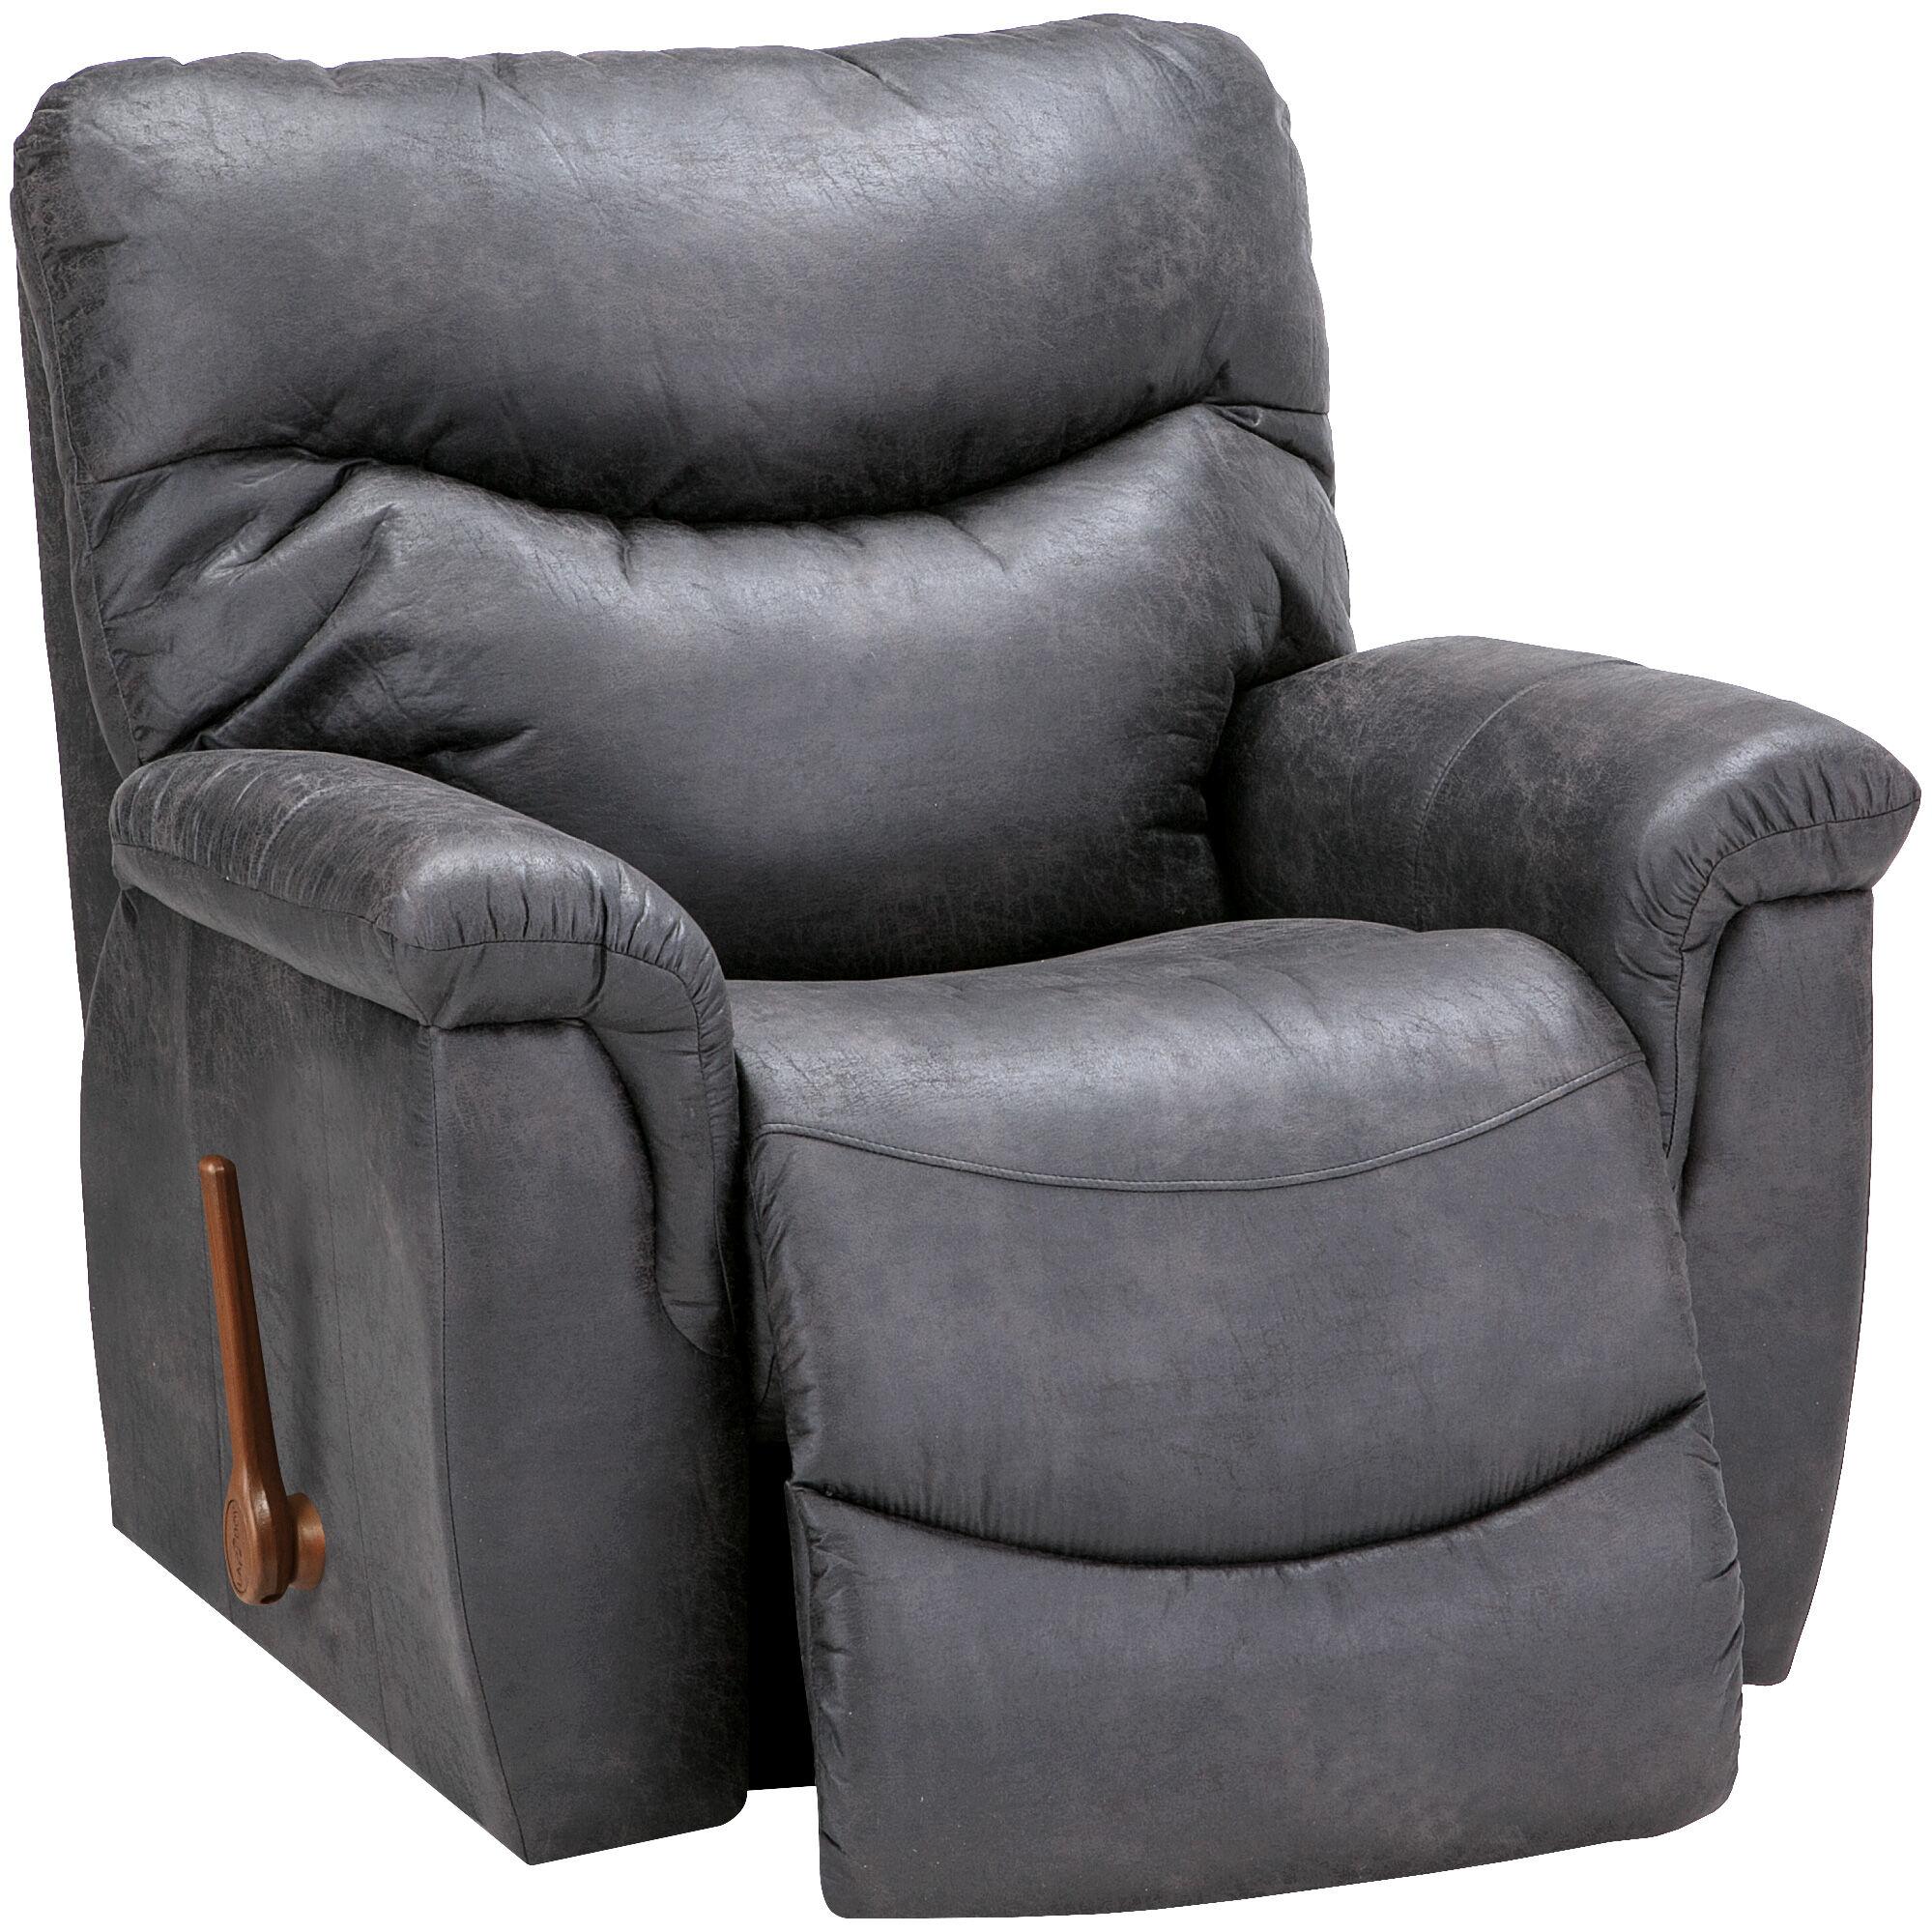 Slumberland Furniture  LaZBoy James Steel Rocker Recliner